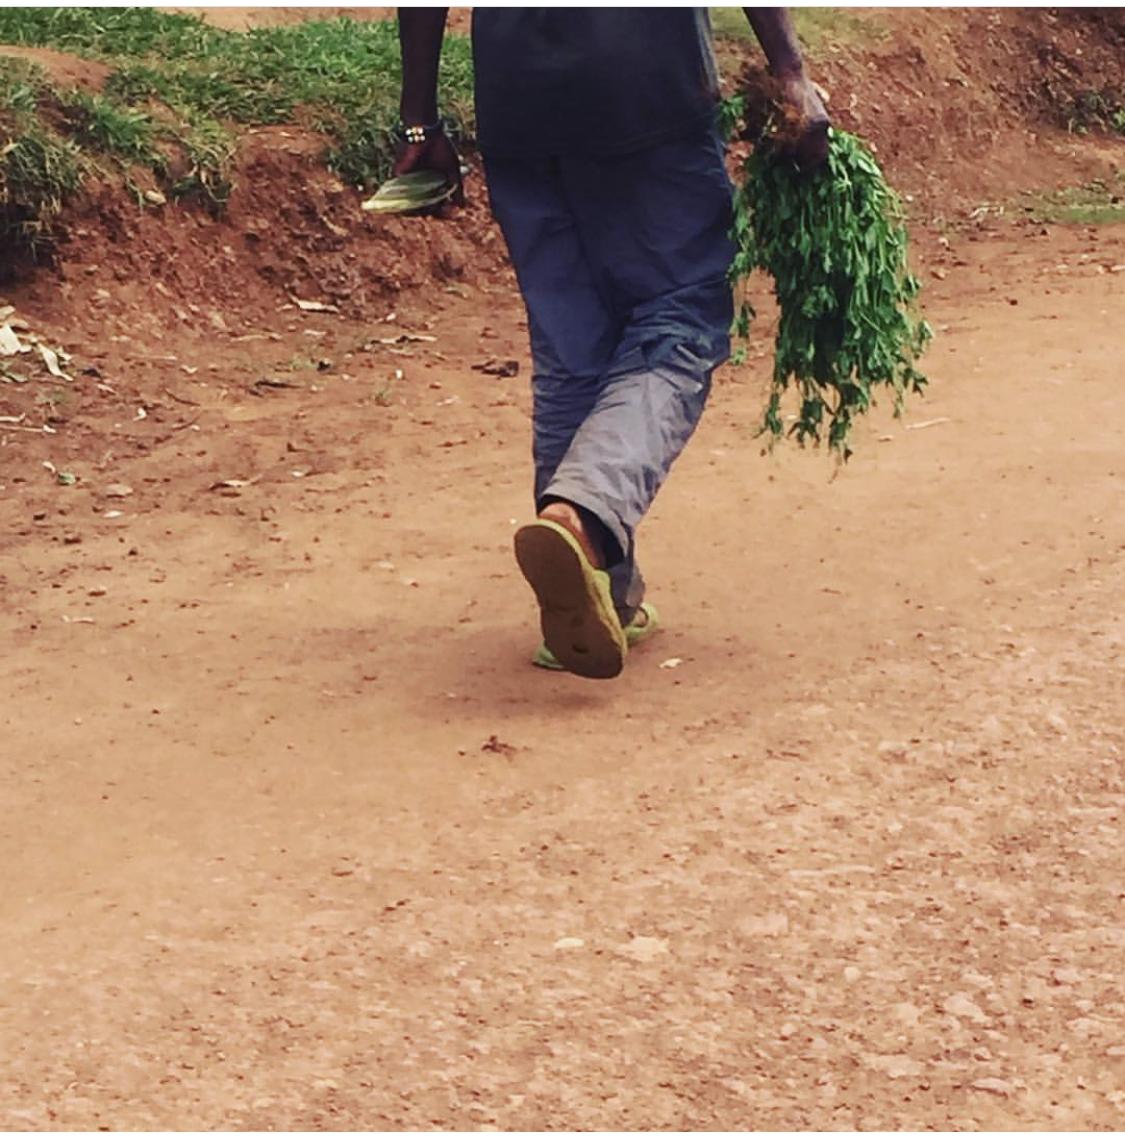 Delicious found for rabit😋😋😋 Kimari.  #sundaywalkrwanda